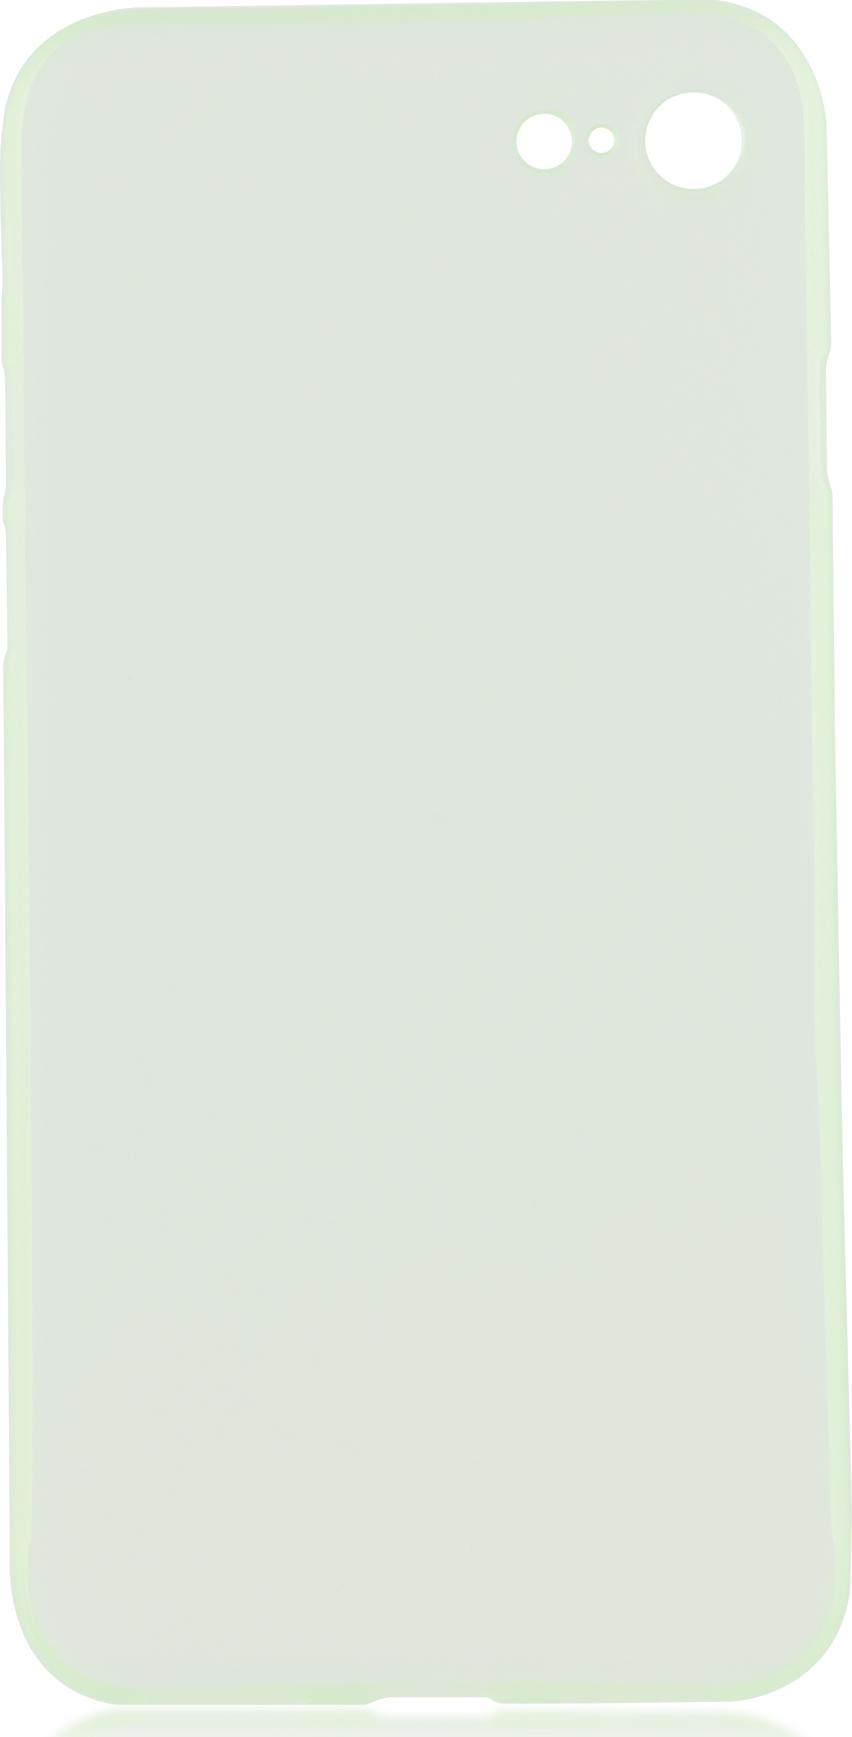 Чехол Brosco SuperSlim для Apple iPhone 7, зеленый чехол для сотового телефона brosco superslim для iphone 6 ip6 pp superslim red красный